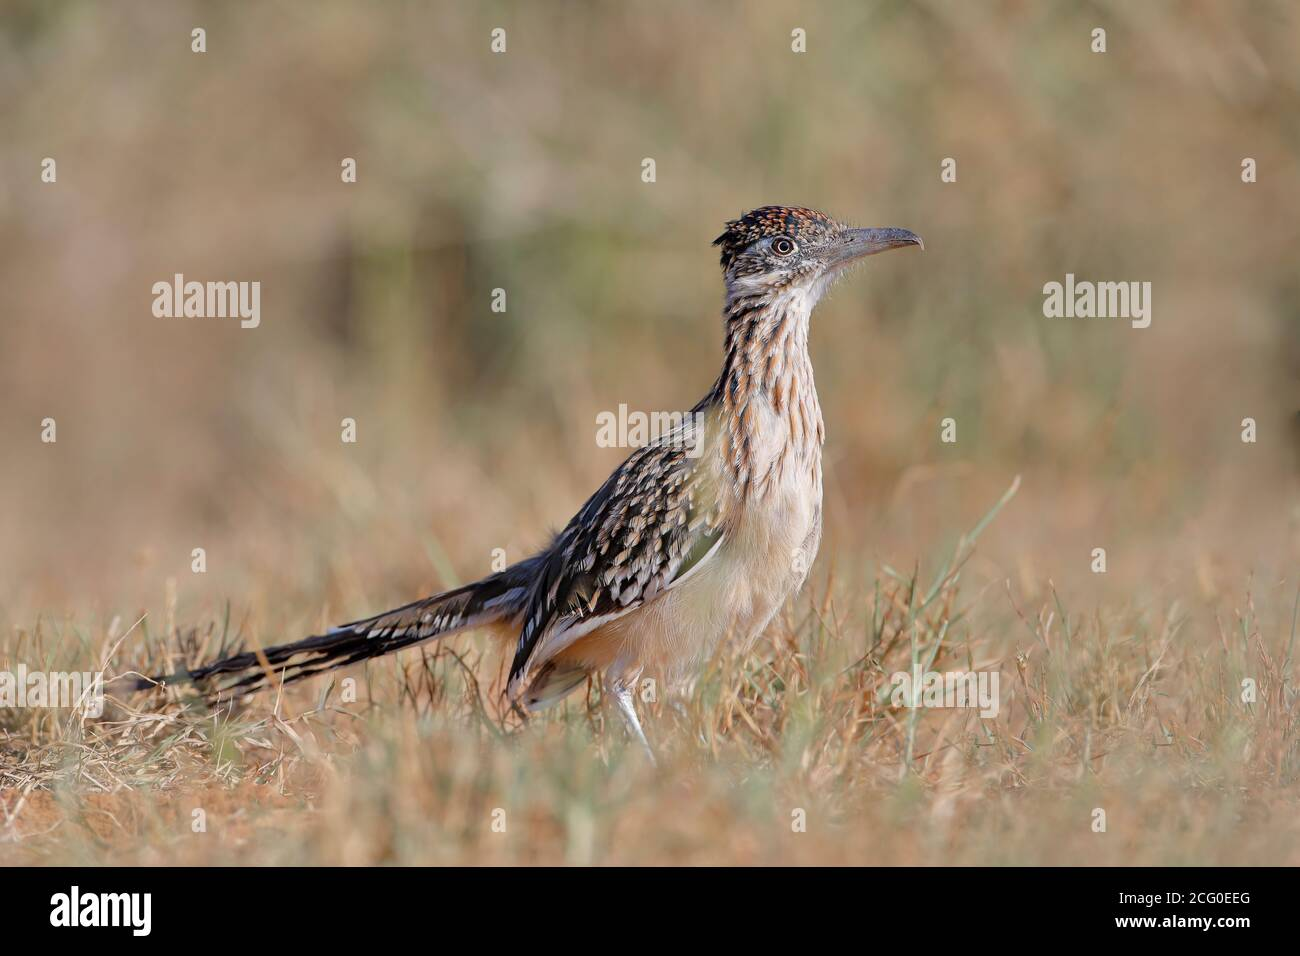 Greater Roadrunner (Geococcyx californianus), South Texas, USA Stock Photo